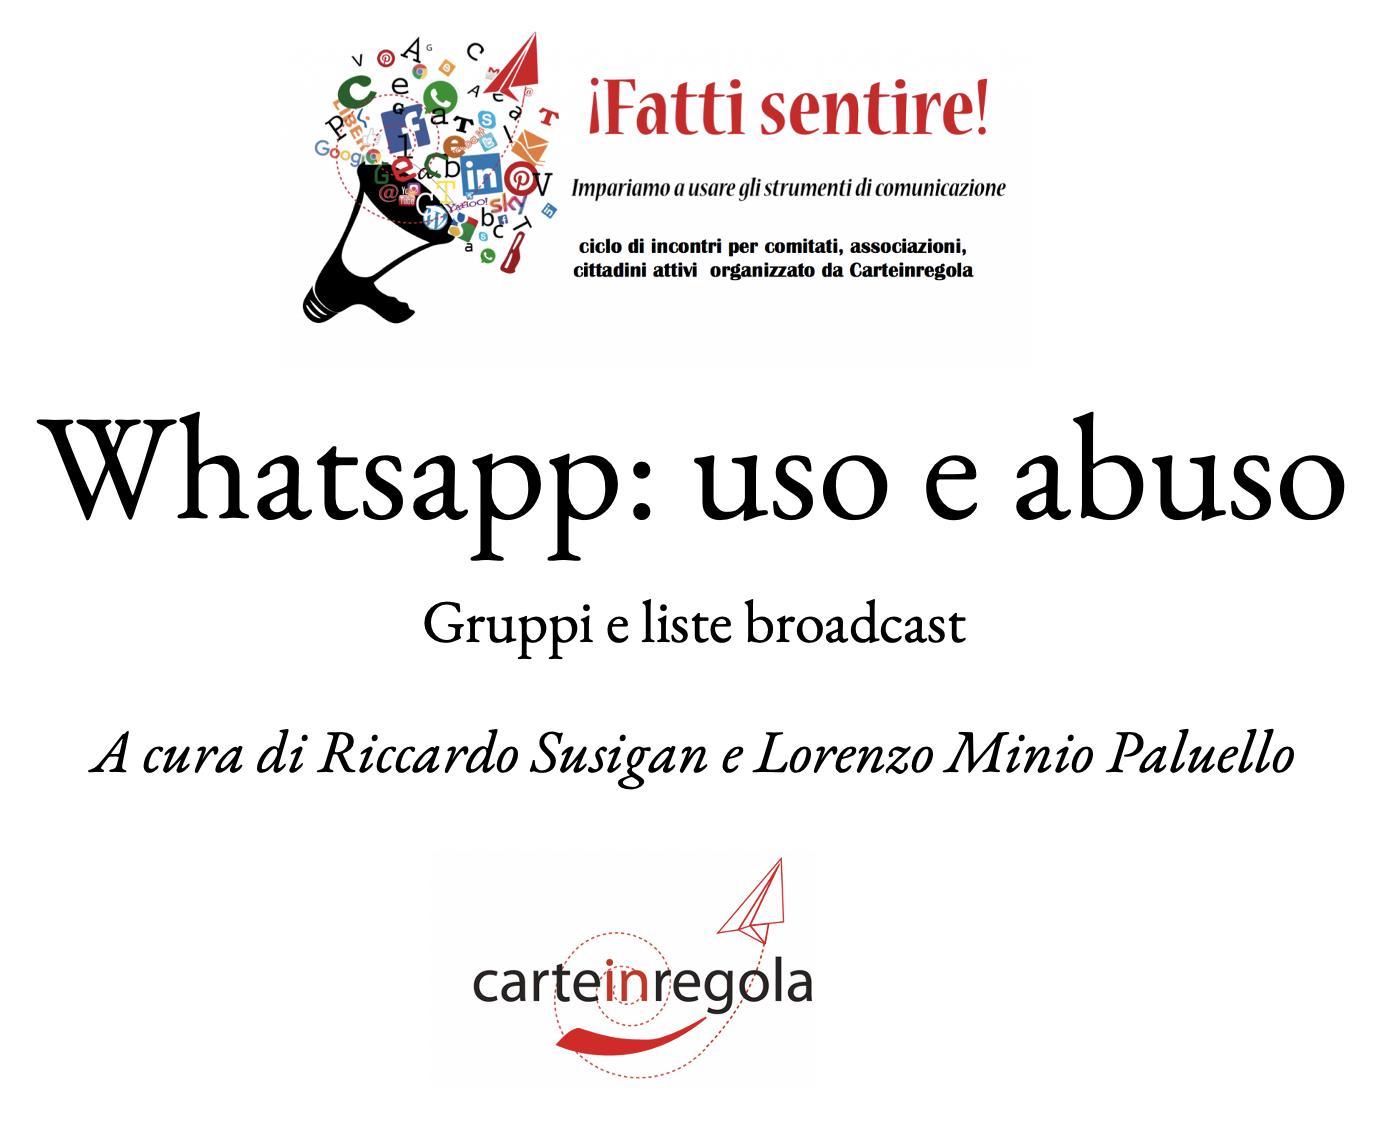 copertina vademecum Carteinregola Watsapp uso e abuso